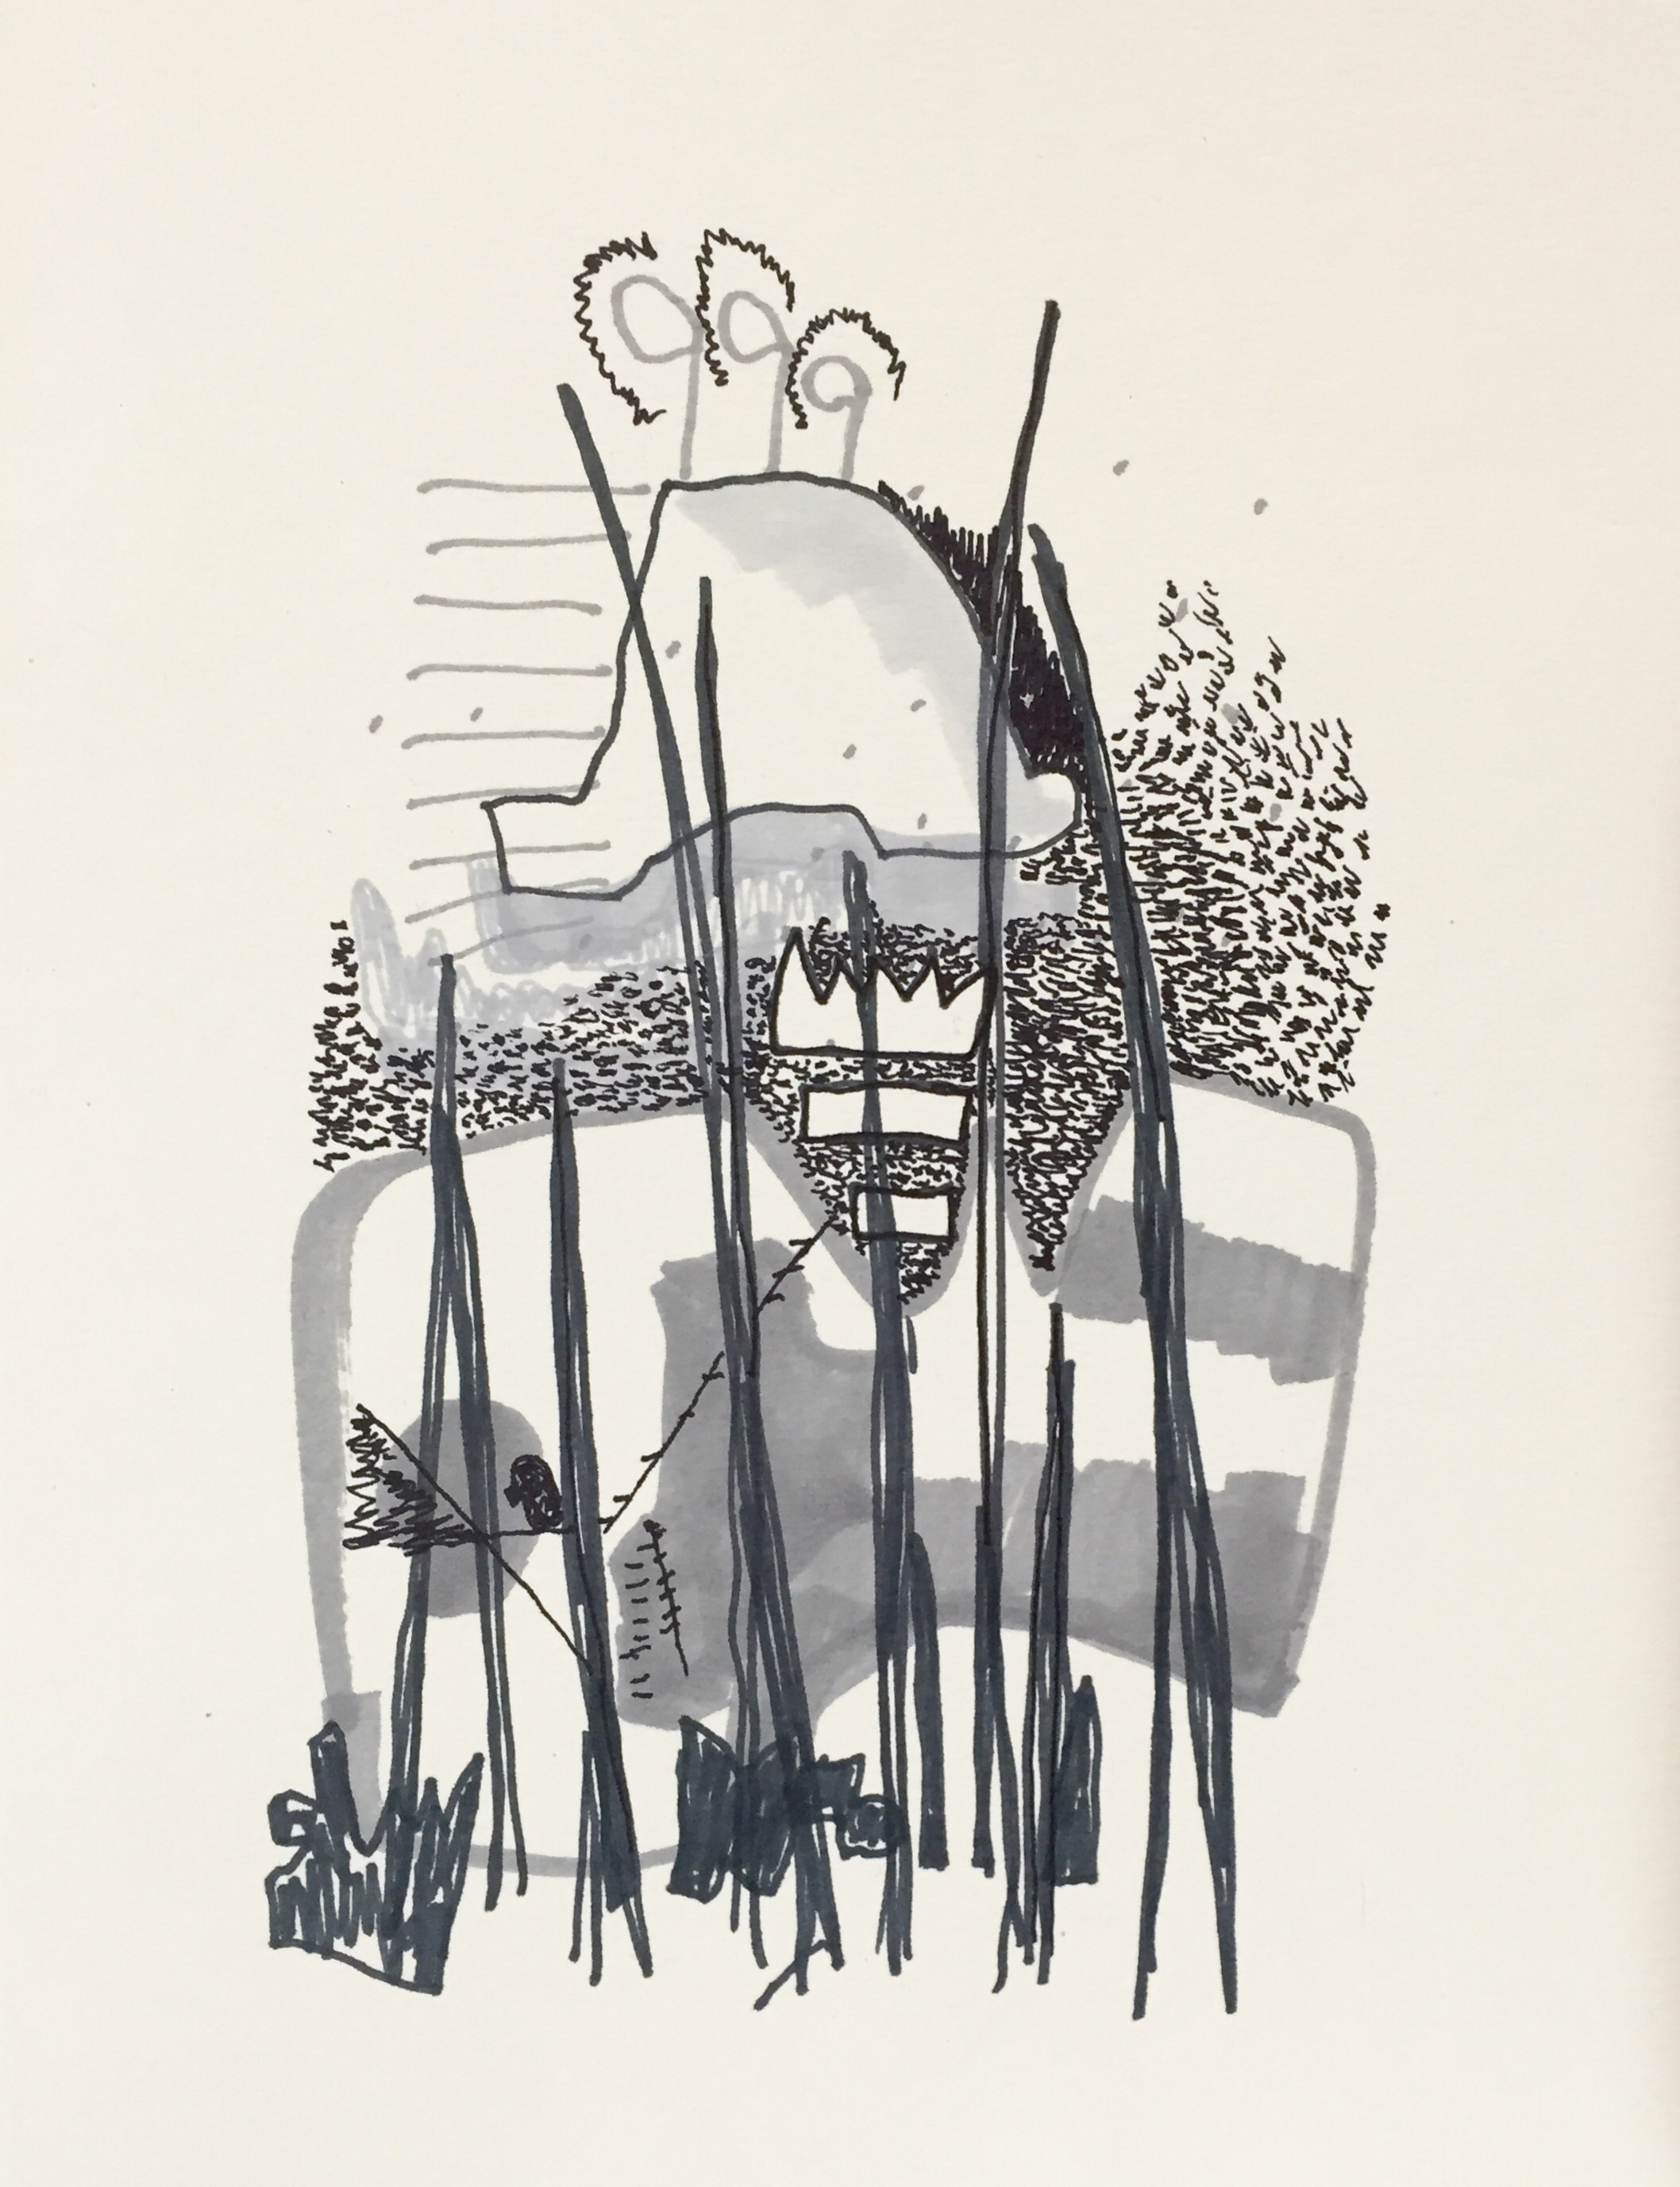 Marker, pen on 130 lb paper